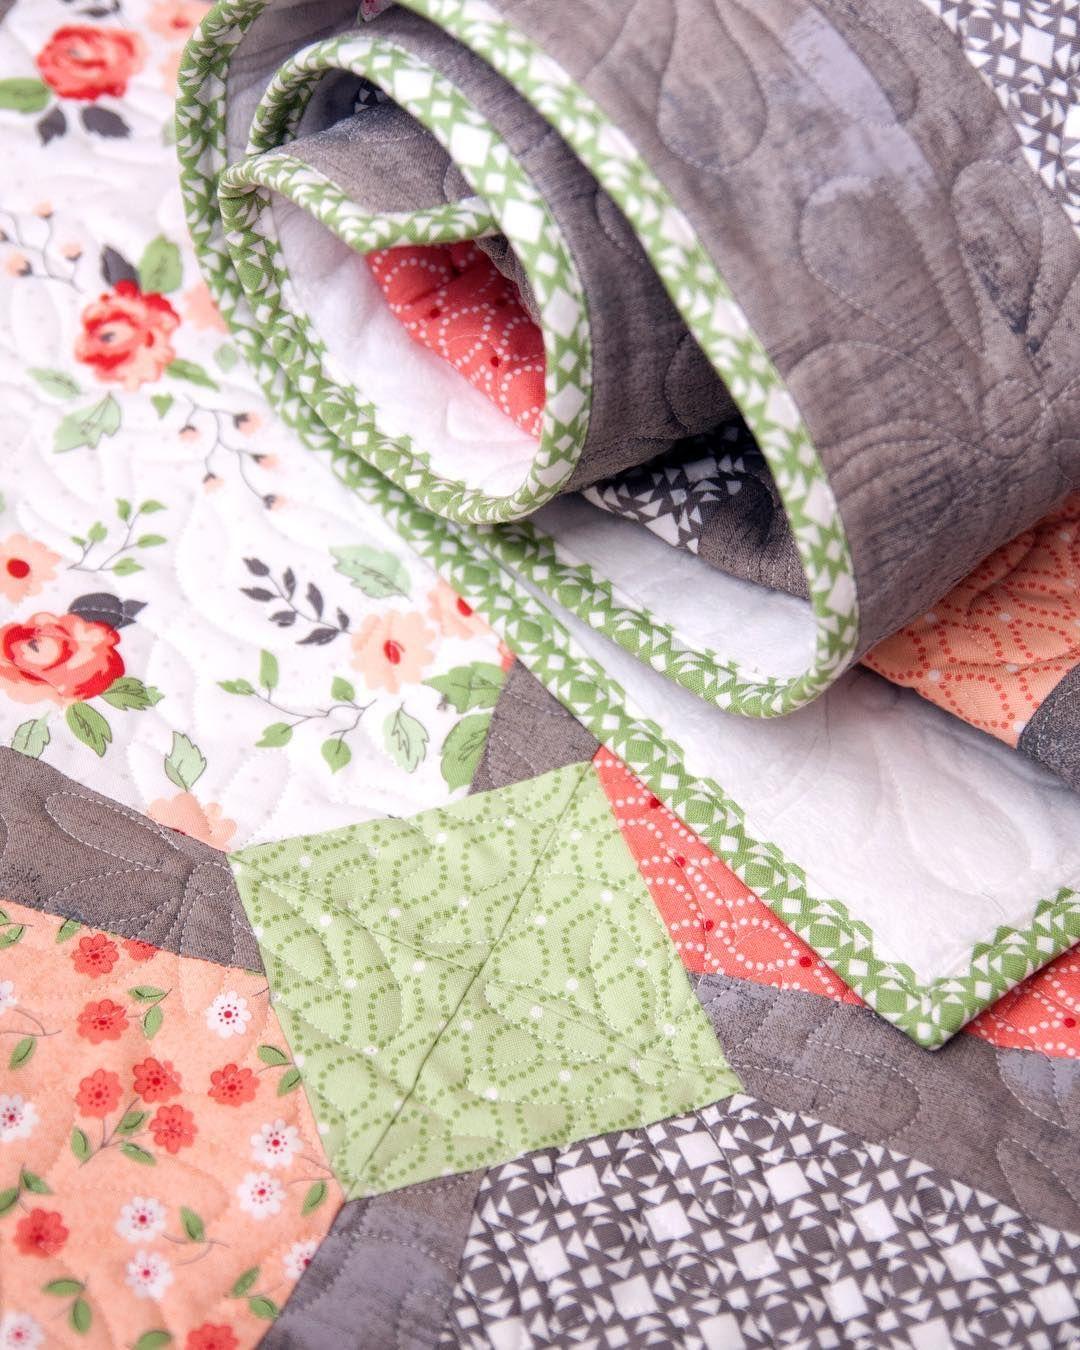 196 Likes, 10 Comments - Vanessa Goertzen (@lellaboutique) on ... : easy breezy quilt pattern - Adamdwight.com